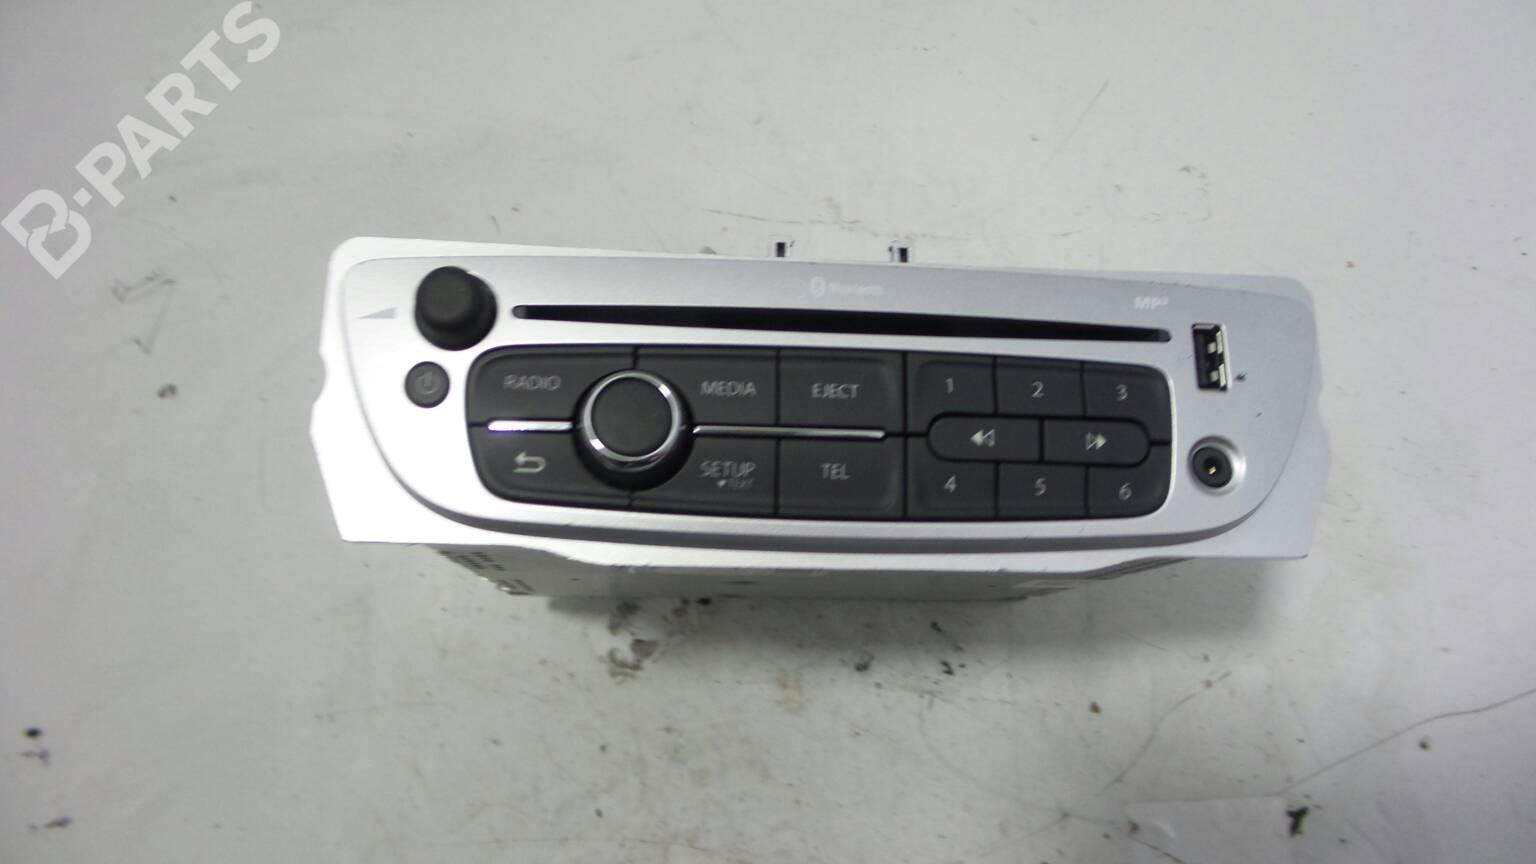 Radio Renault Megane Iii Grandtour Kz0 1 15 Dci Kz09 Kz0d Kz1g Fuse Box Parts 2811 580 23r